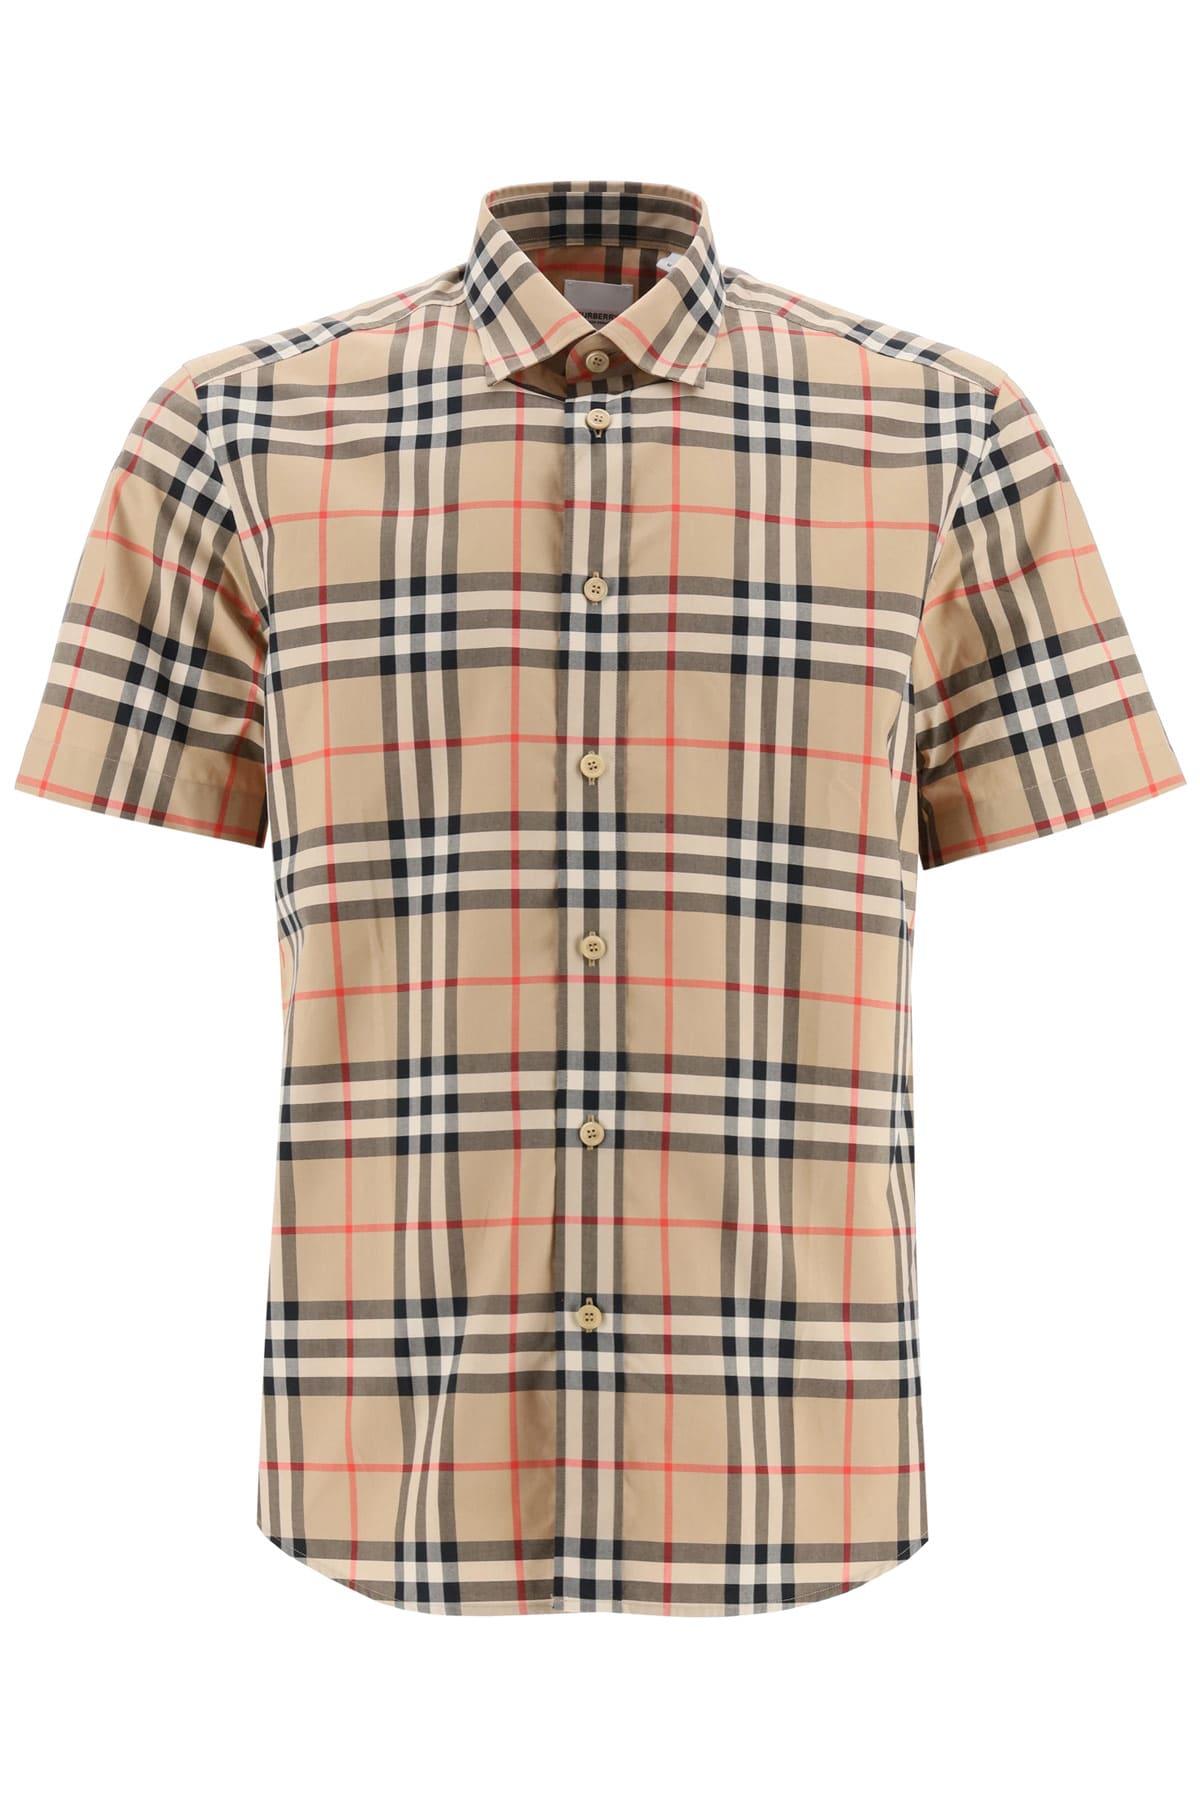 Caxton Shirt Vintage Check